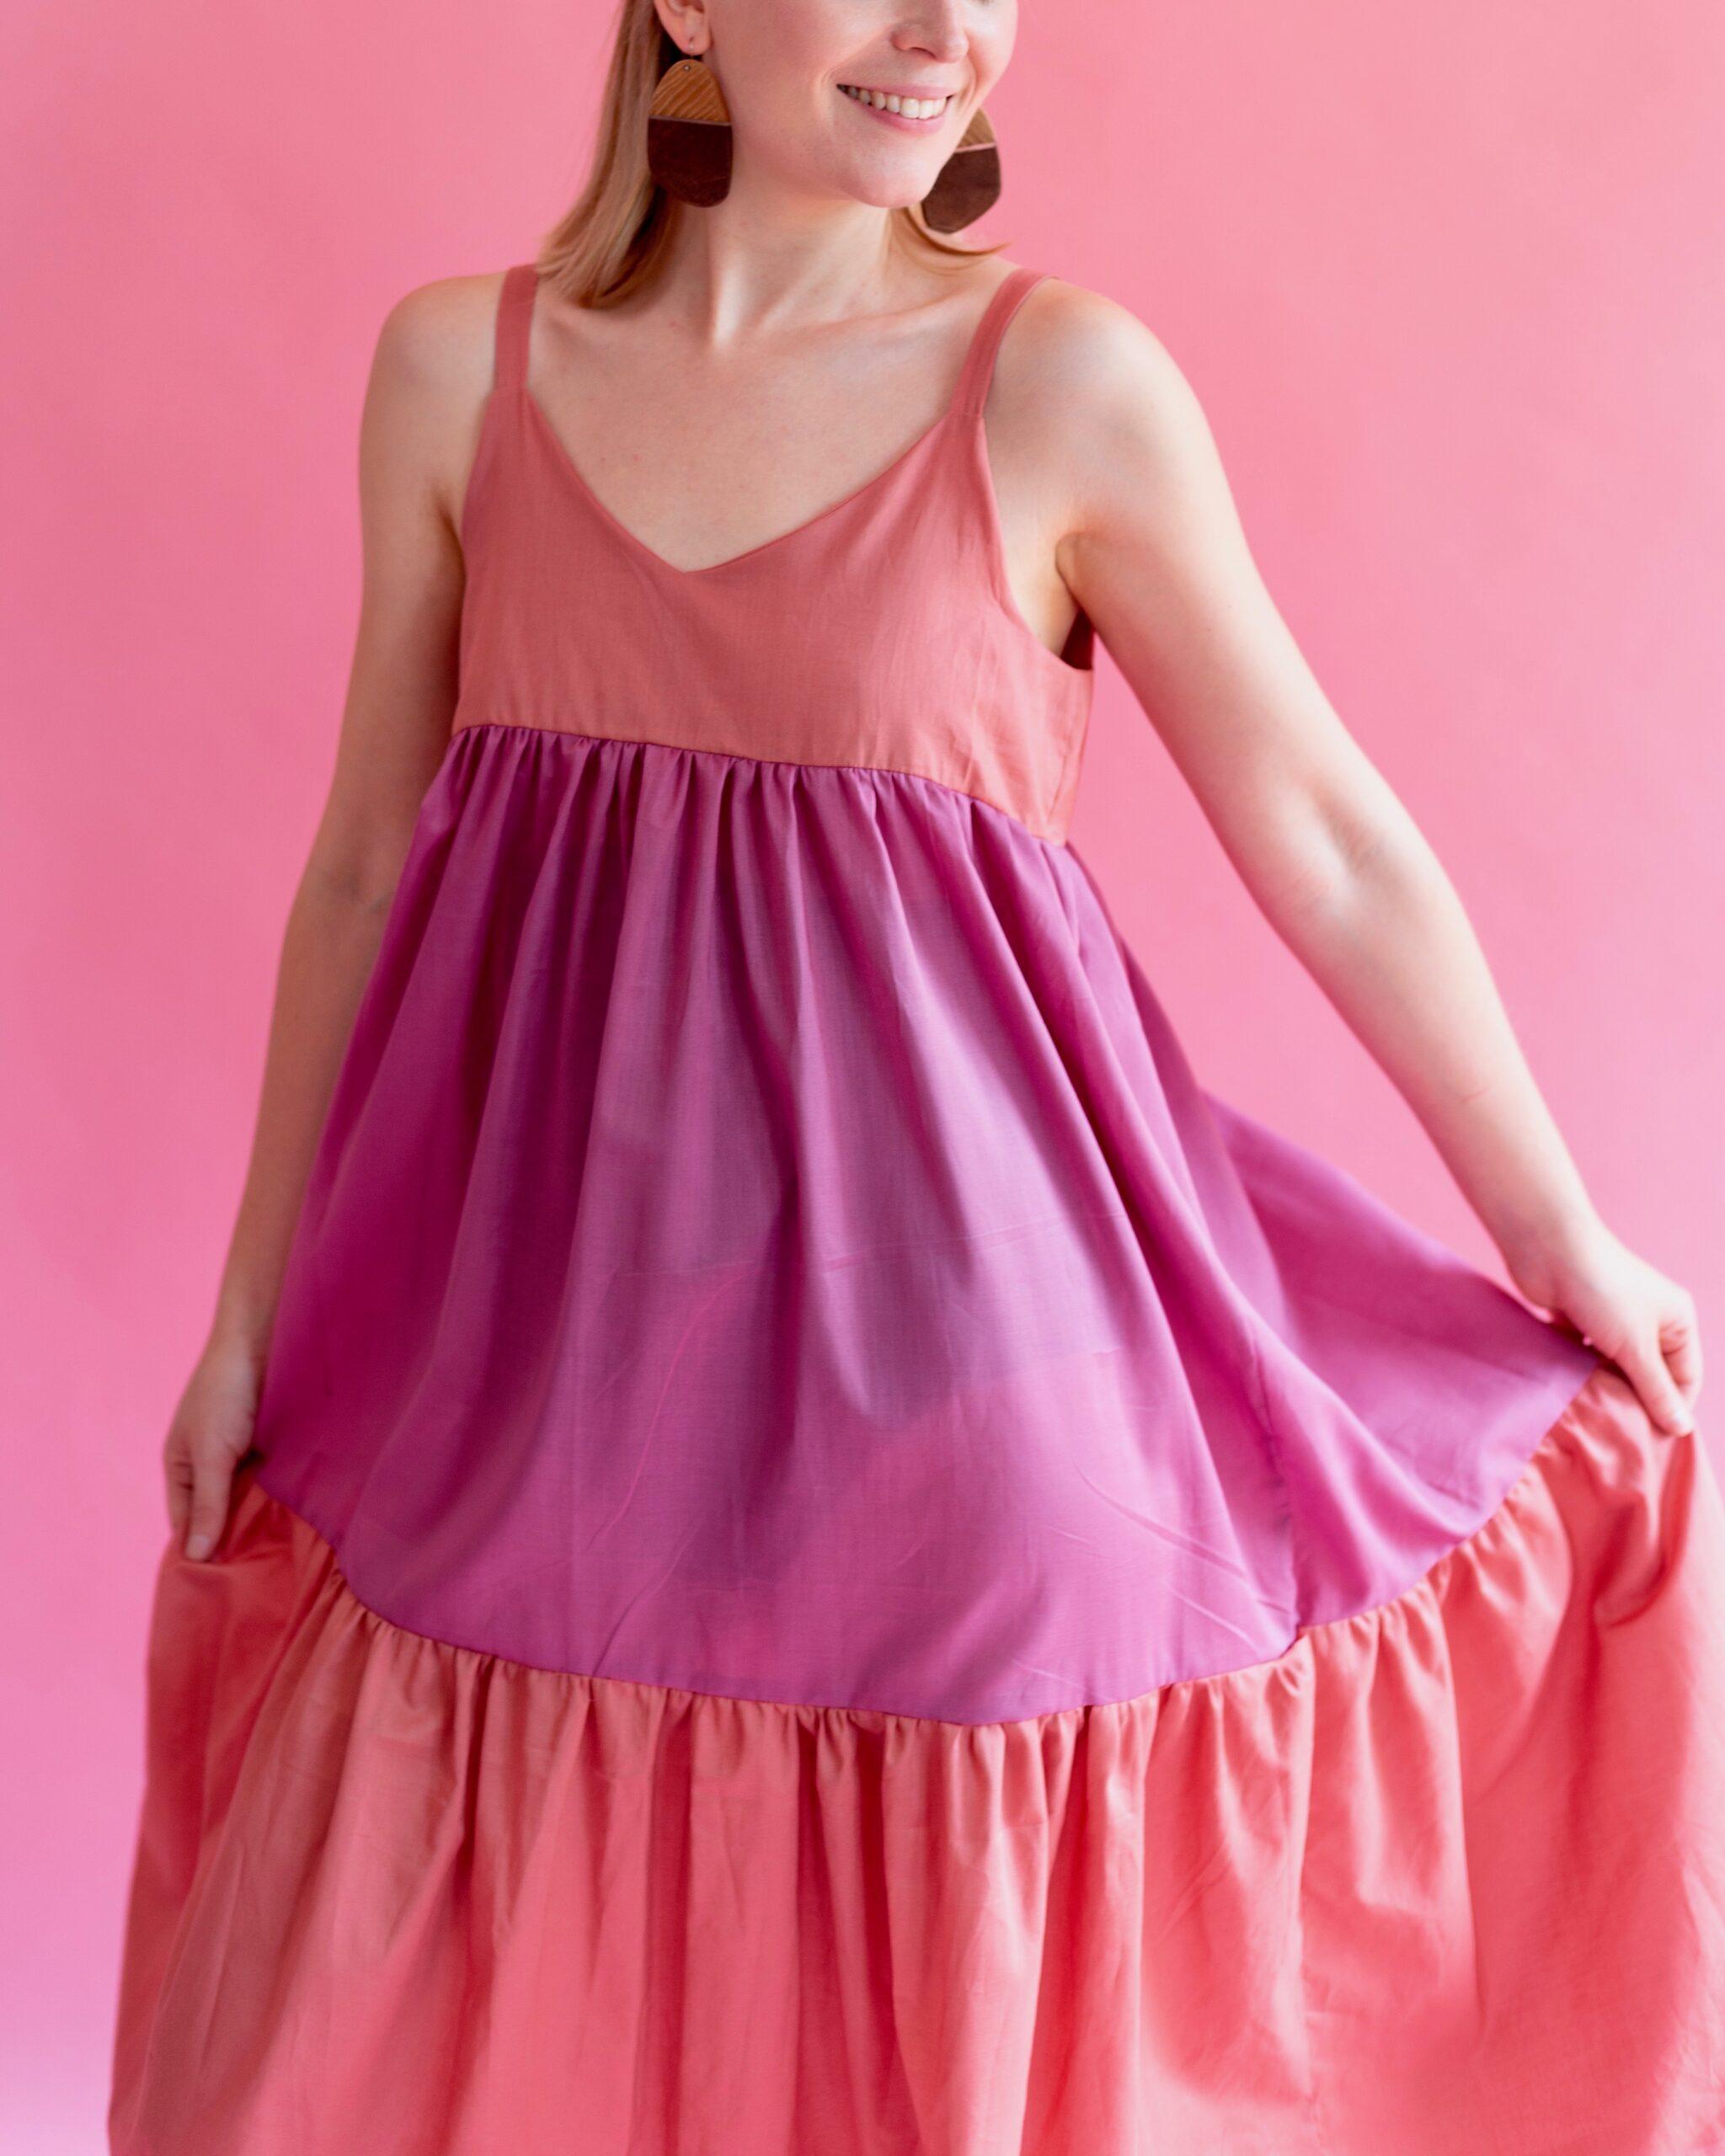 pink and orange full length organic dress